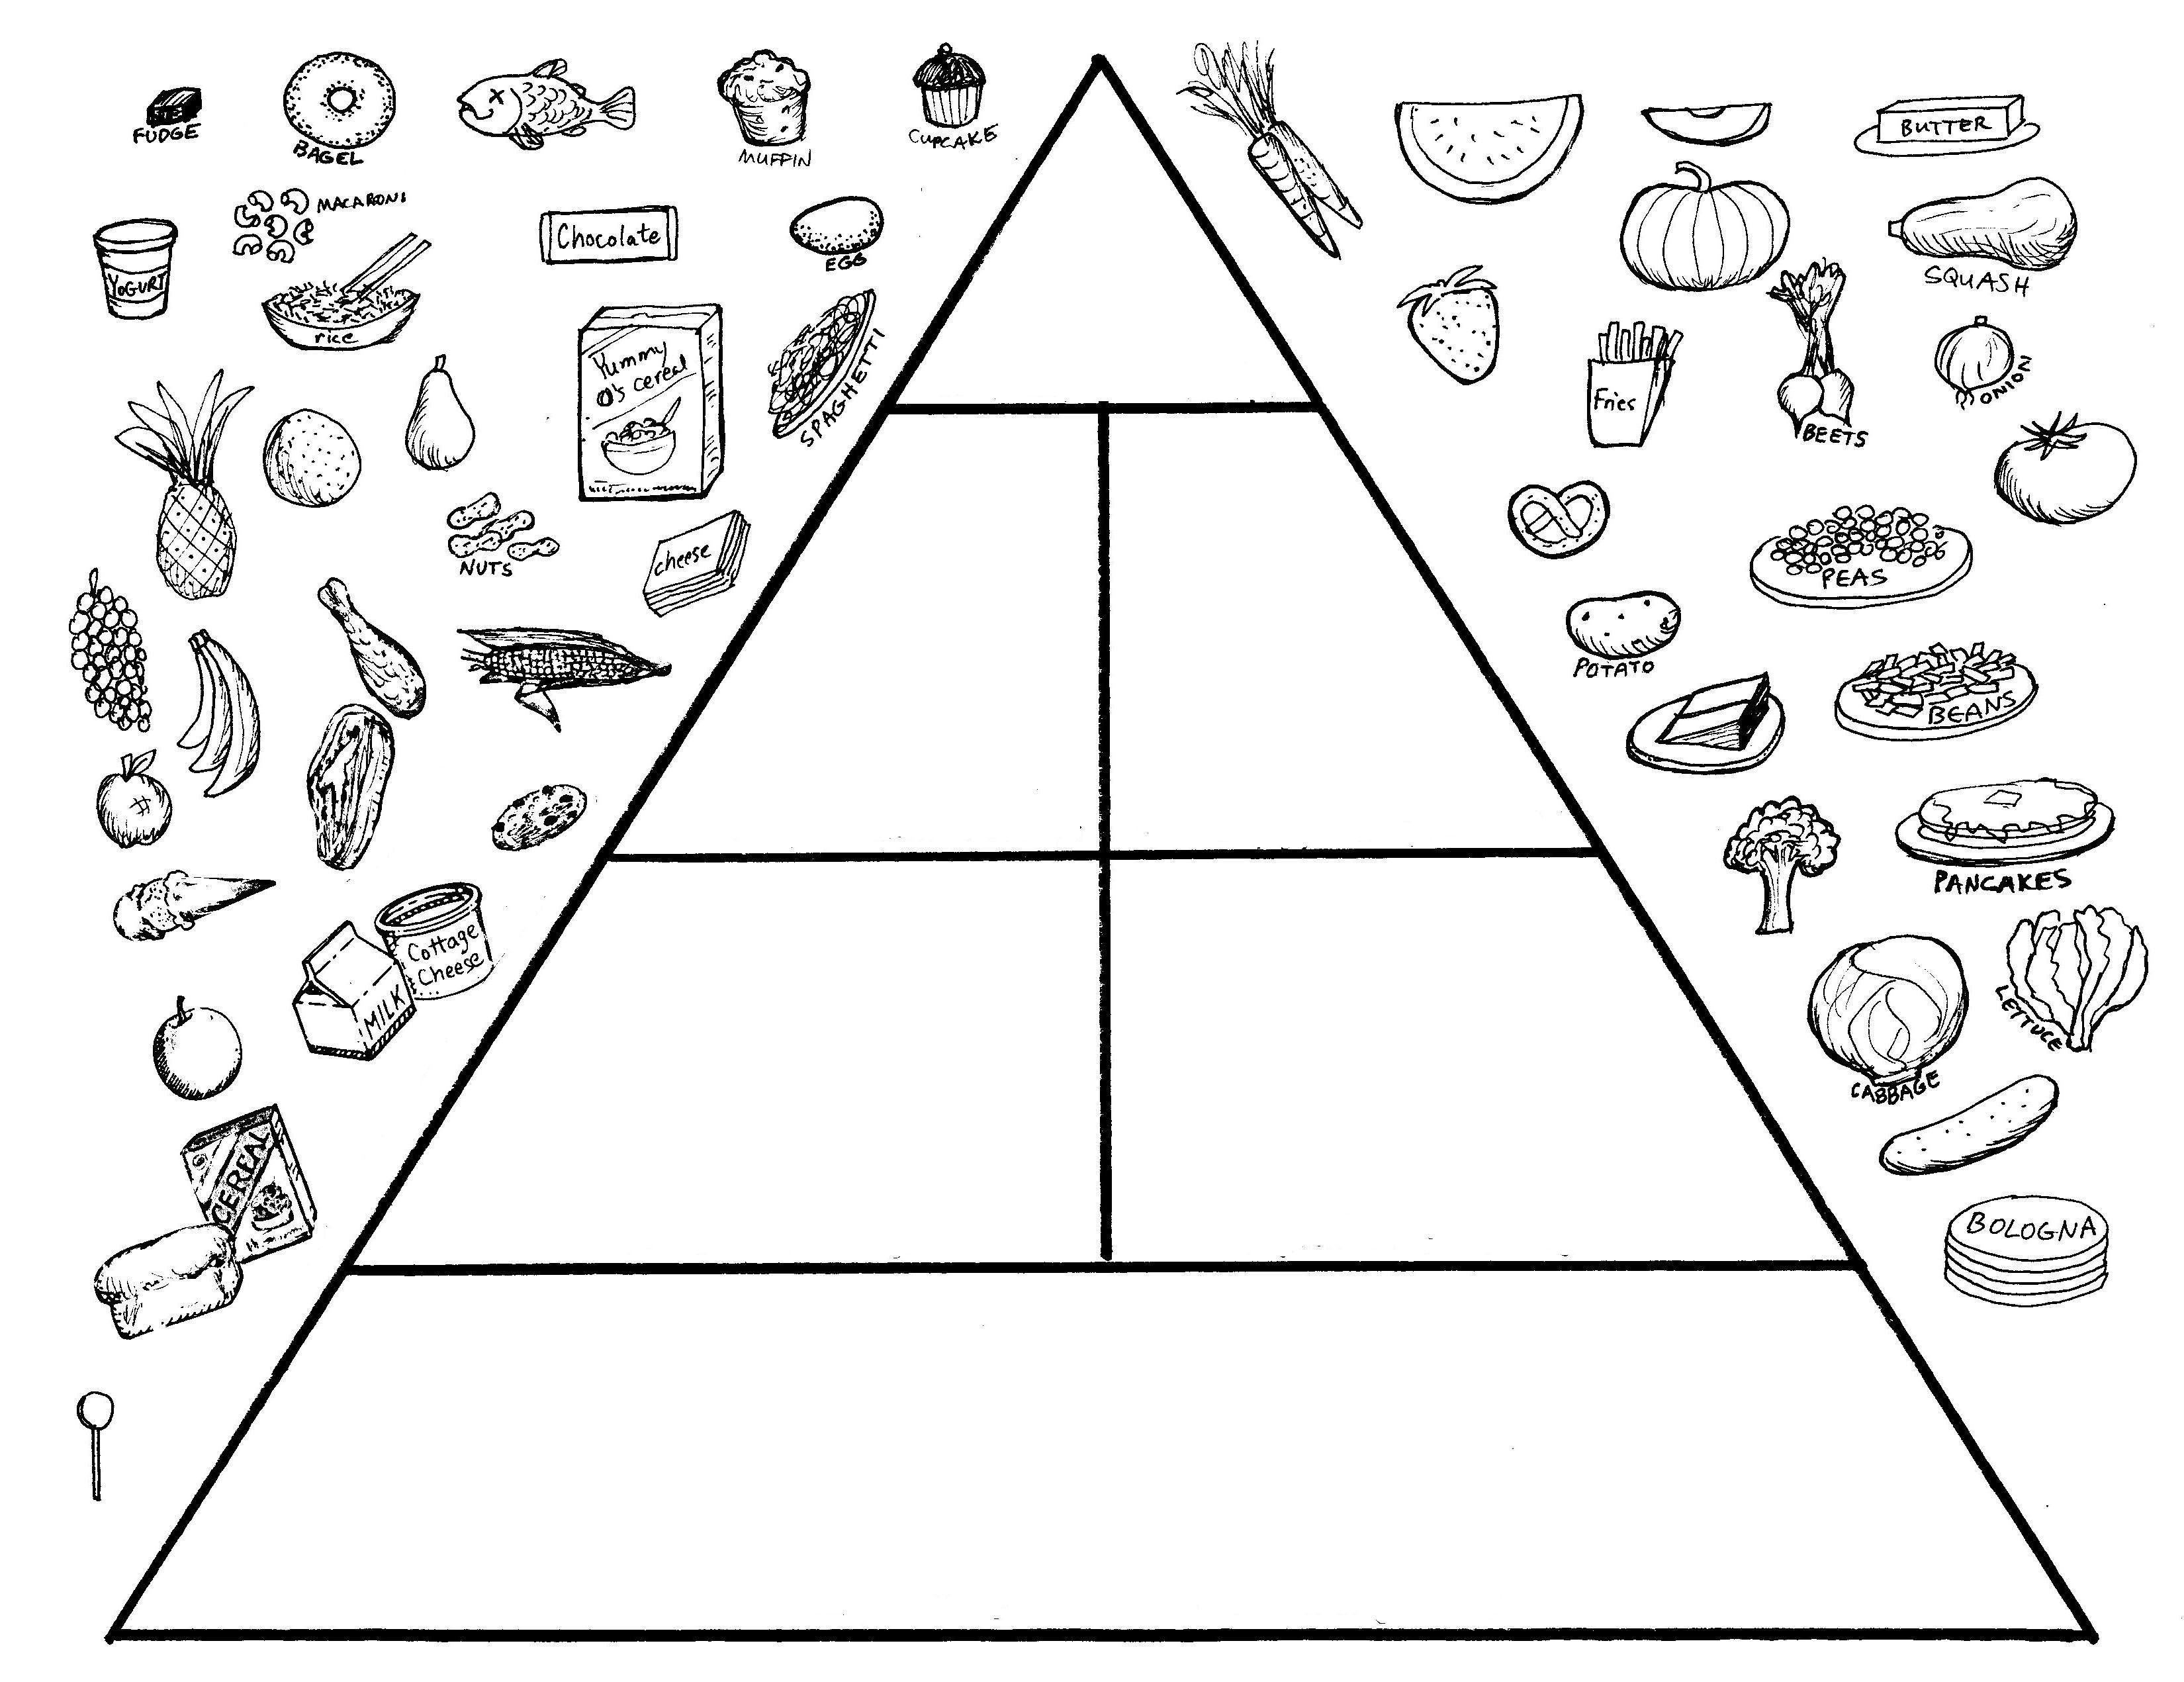 18 Free Esl Food Pyramid Worksheets